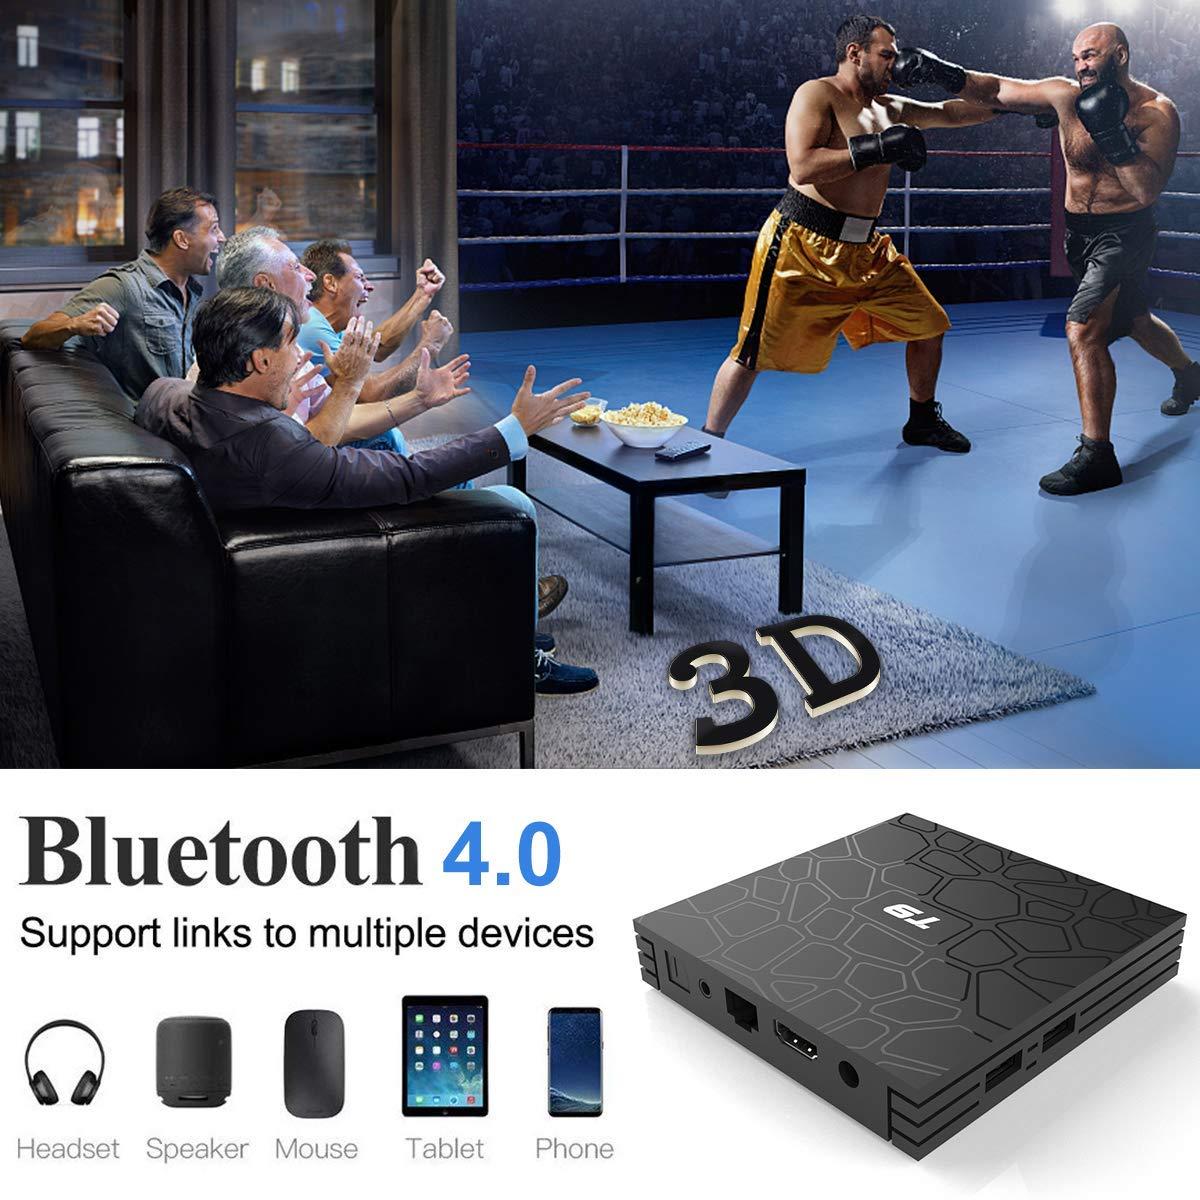 2018 T9 tv box android 8.1 WIFI 4 gb 64 gb TV Box Bluetooth 4.0 RK3328 Quad Core 4g 32g Smart tv Set-Top box android 8.1 Boîte 5g - 3